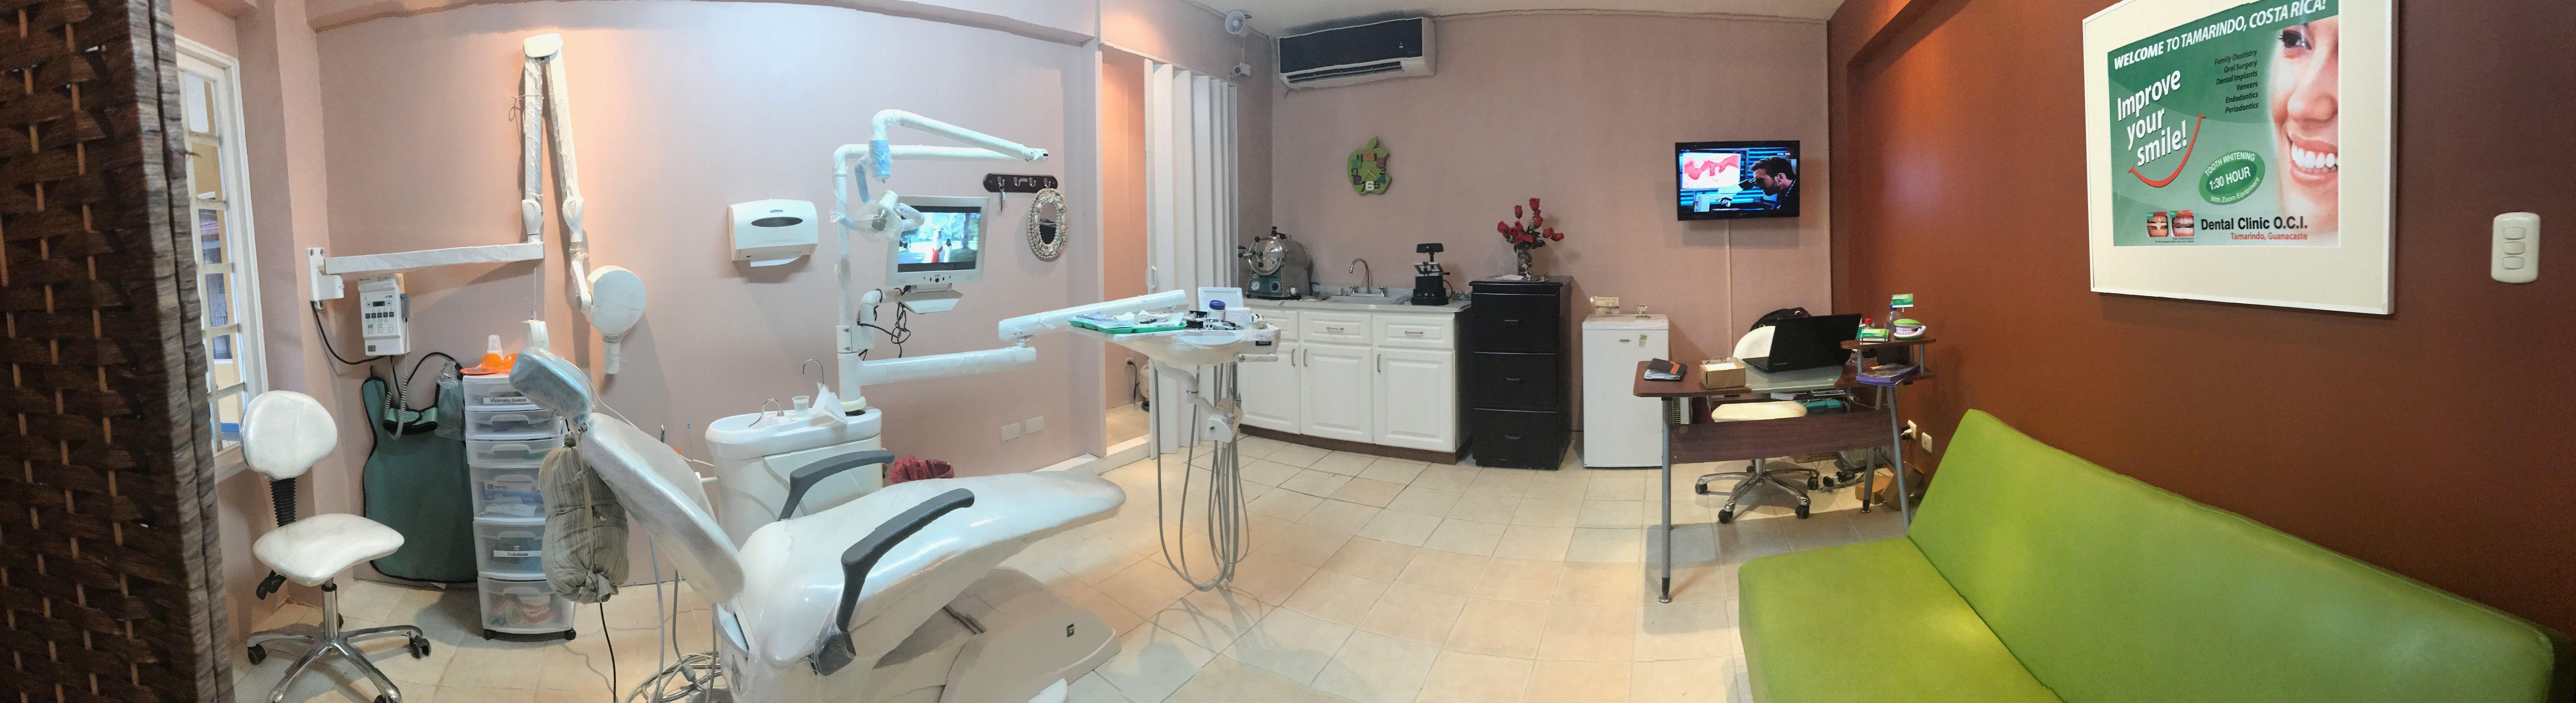 Dental Clinic OCI Tamarindo